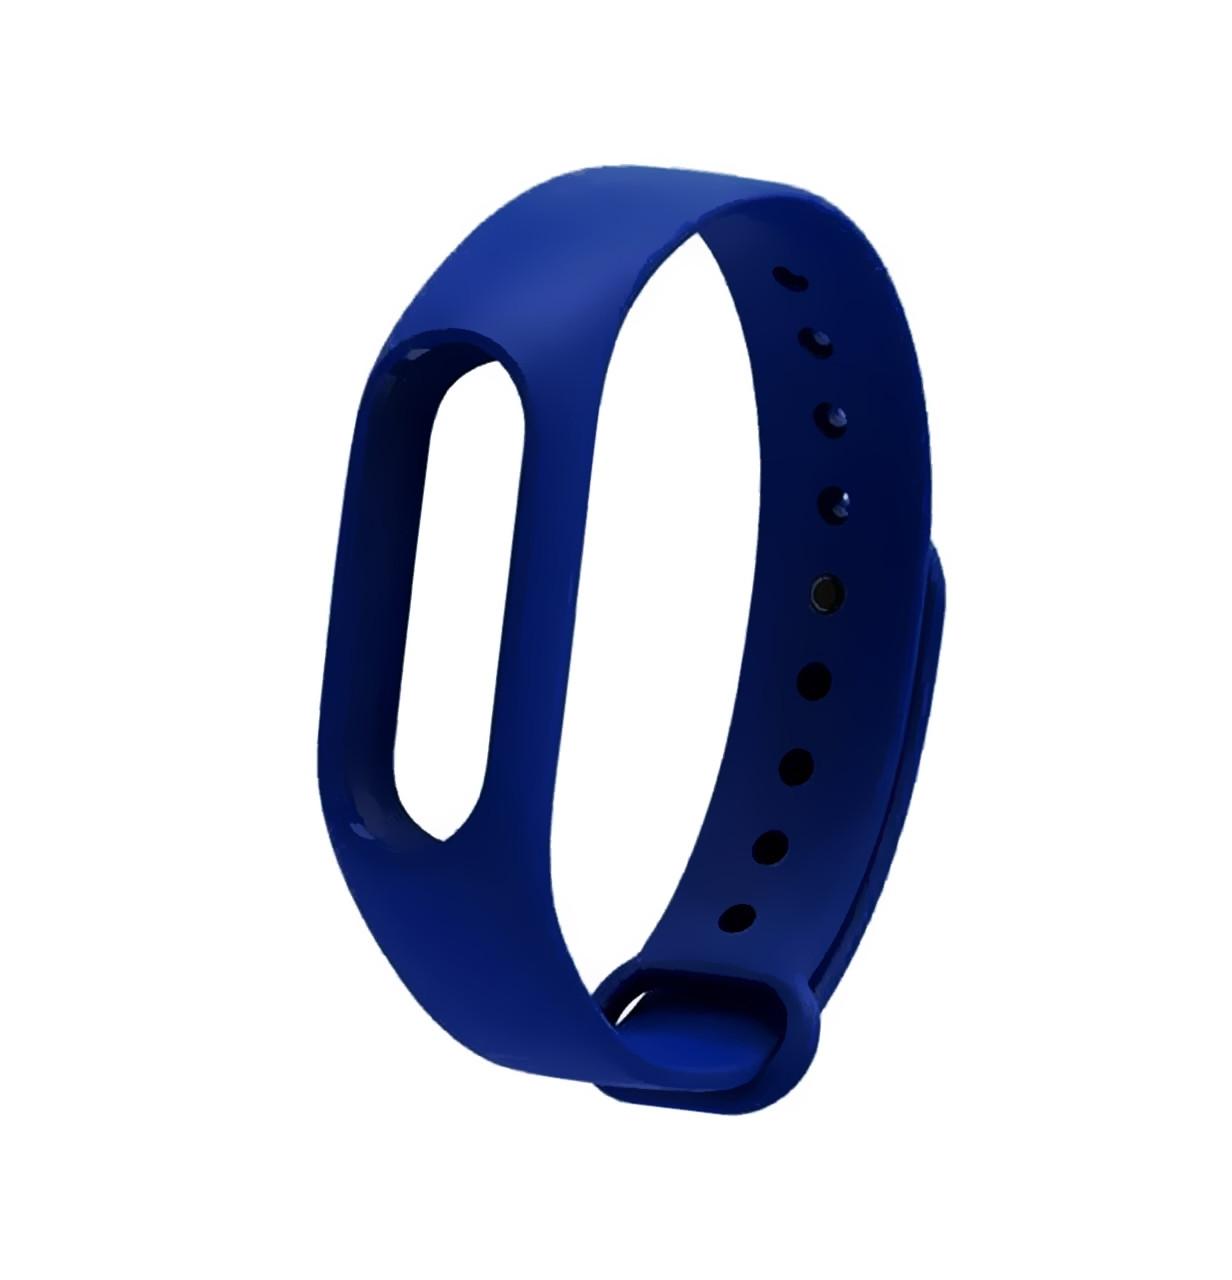 Ремешок Silicone для фитнес-браслета Xiaomi Mi Band 2 Navy Blue